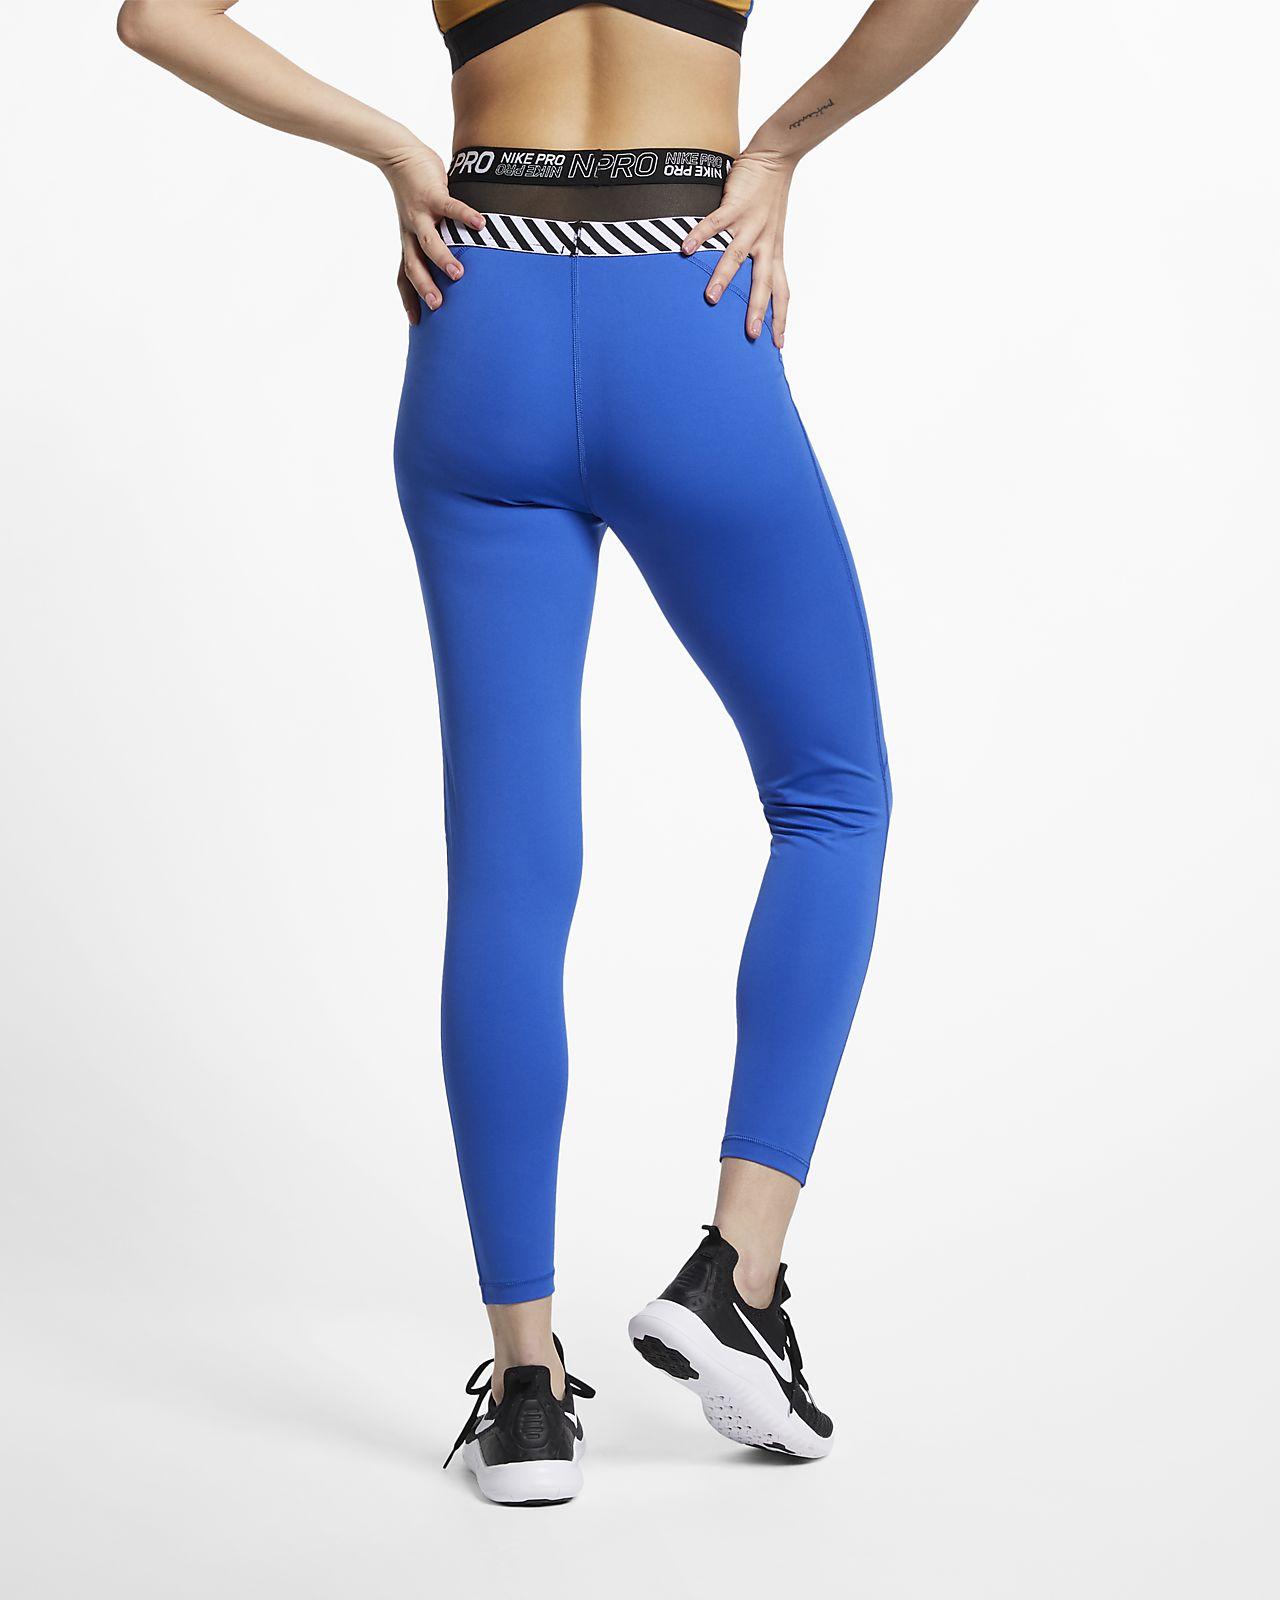 7a841b9186 Nike Pro HyperCool Women's 7/8 Length Tights. Nike.com